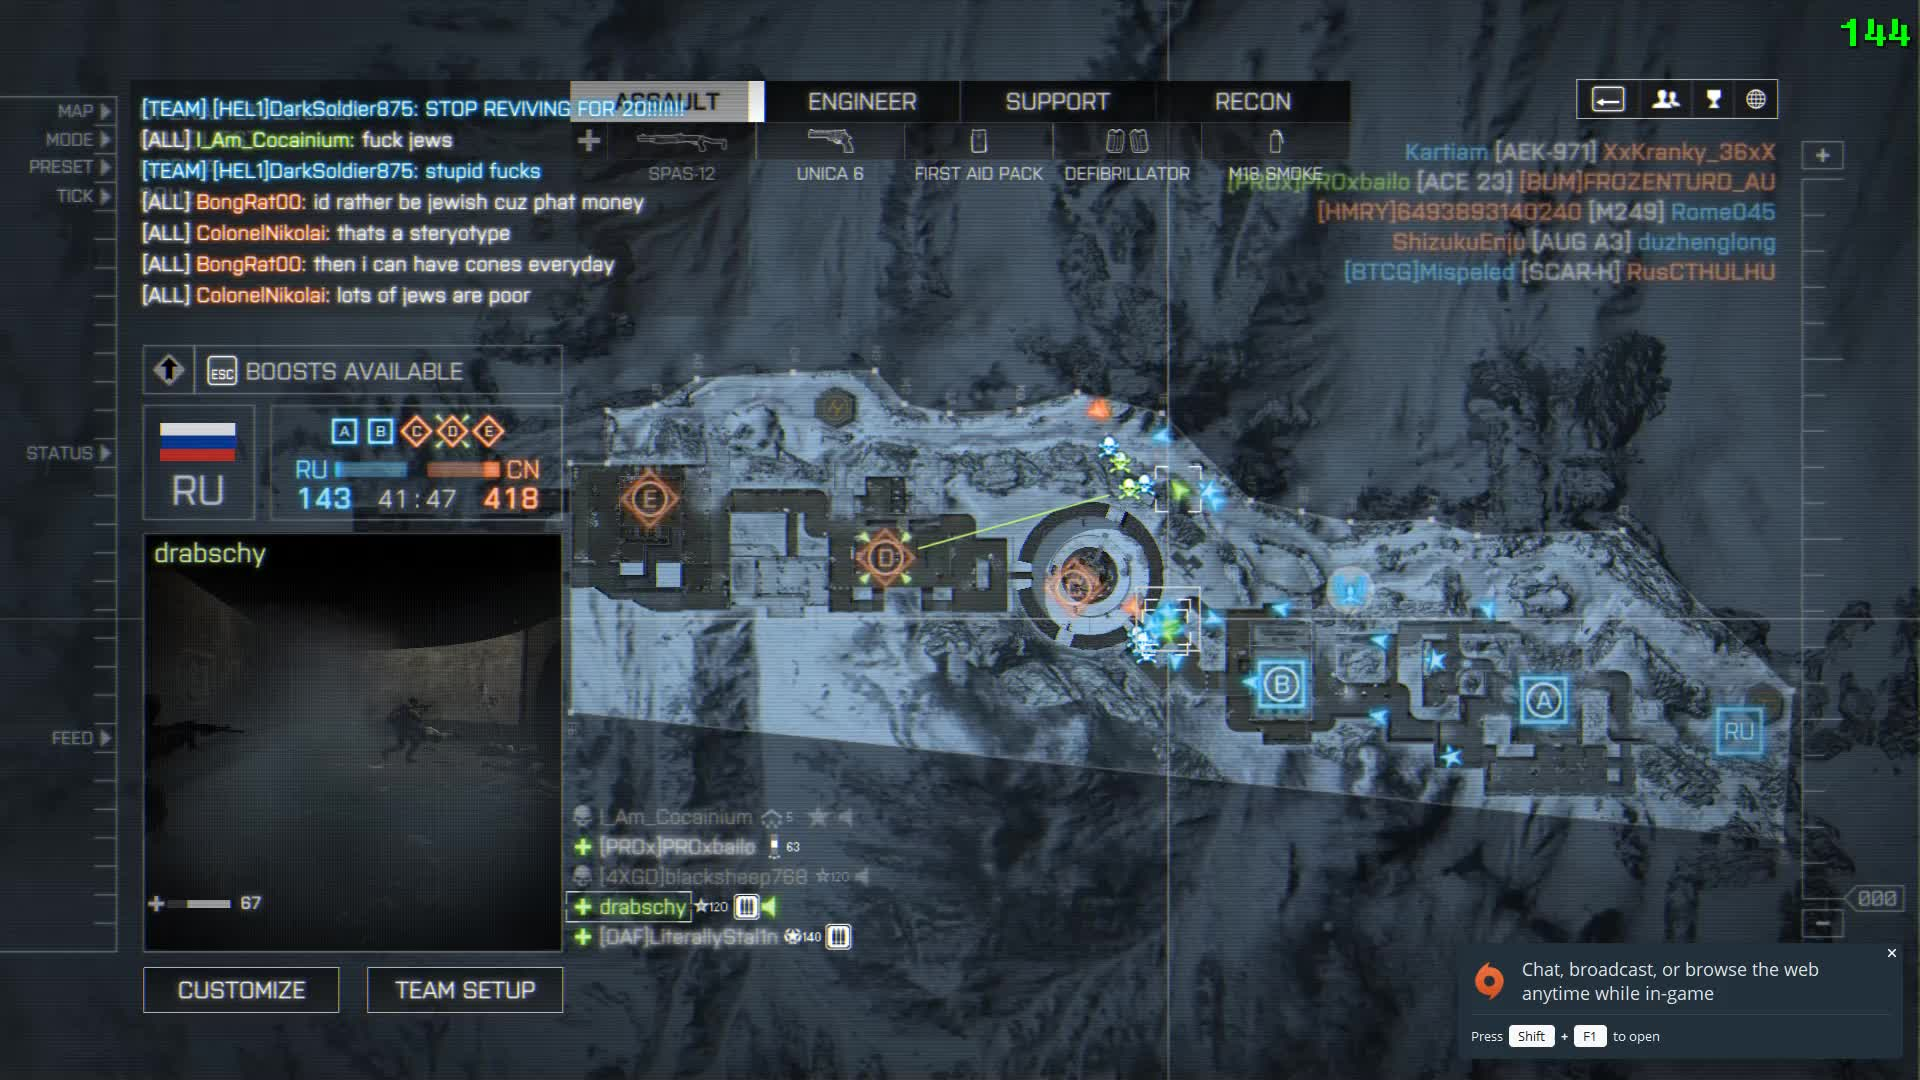 R8, Battlefield 4 GIFs